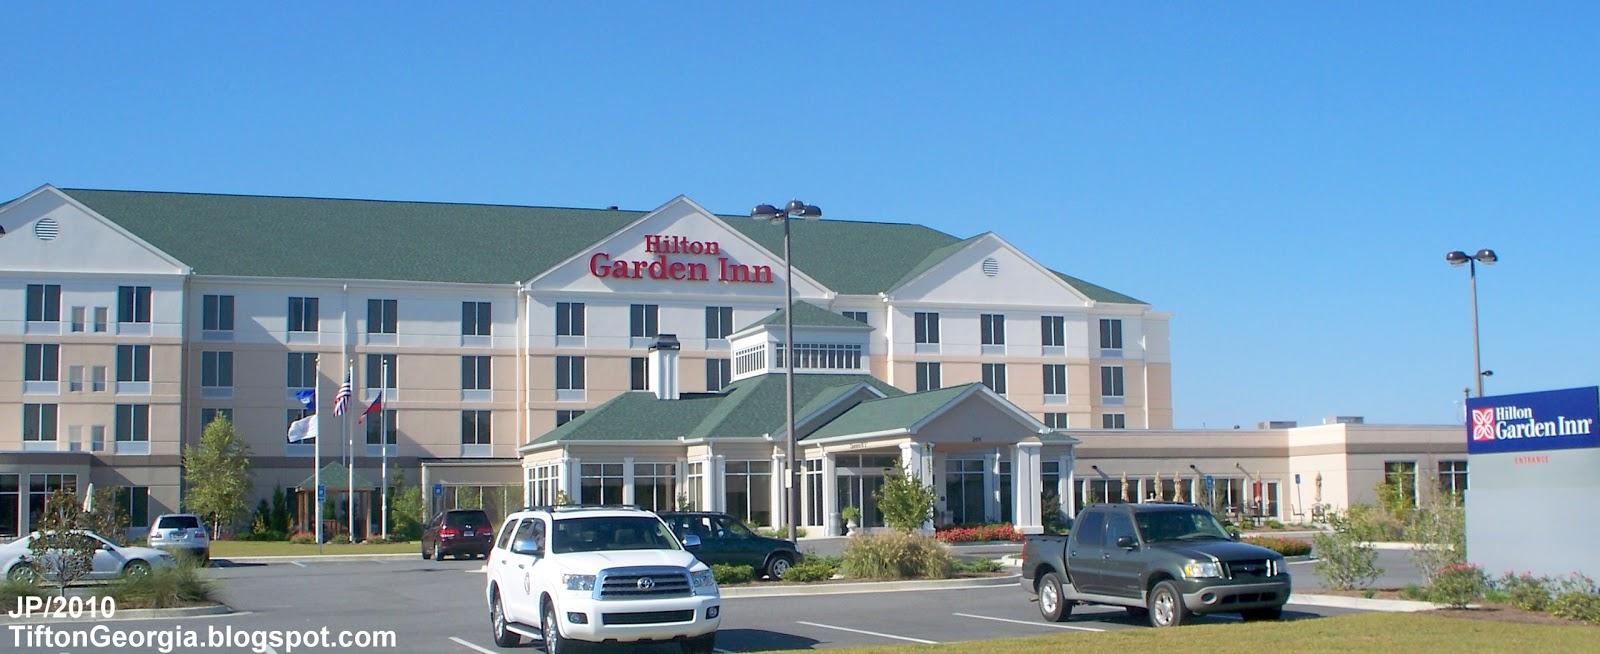 Hilton Garden Inn Hotel Tifton Georgia Boo Drive Lodging Tift County Ga